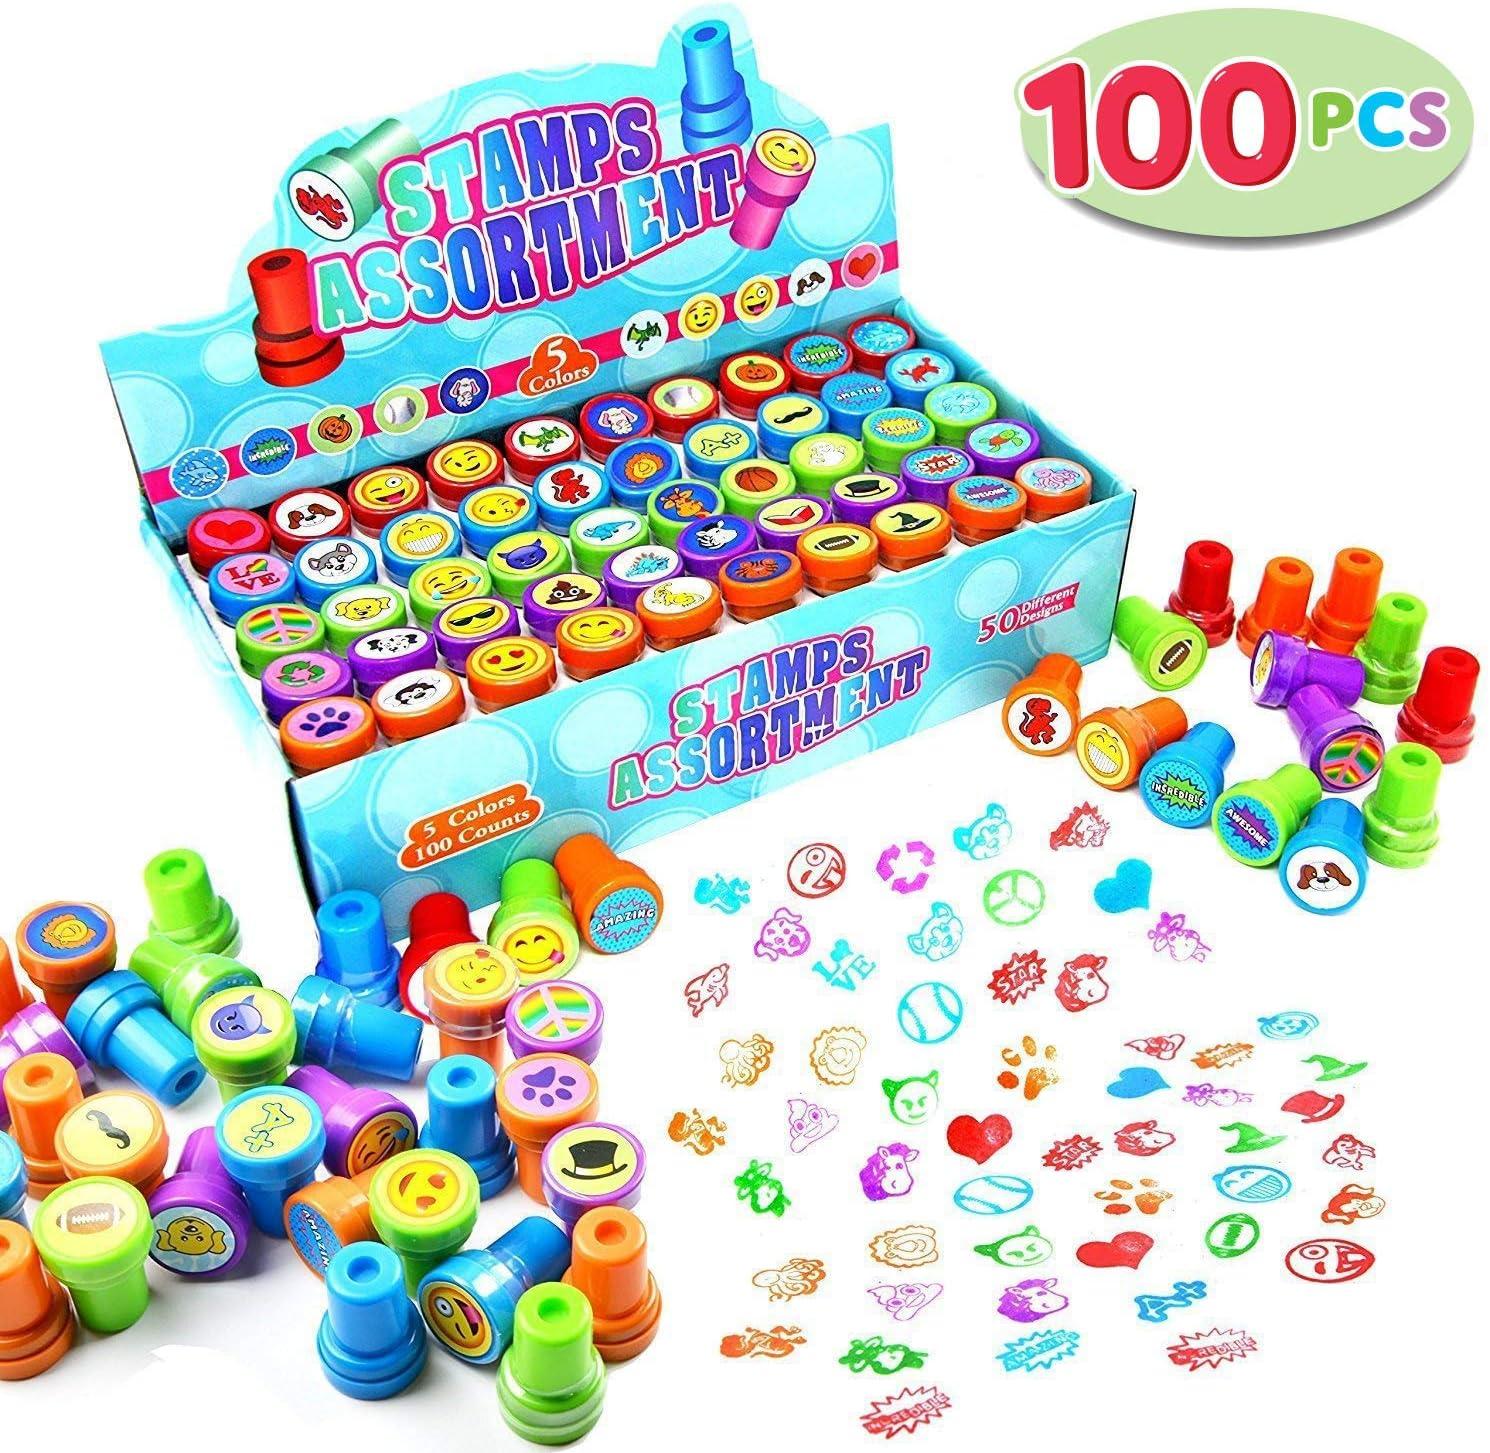 Spiral Glitter Wand x1 Beautiful Patterns /& Colours Kids Toys Gifts Childs Kids